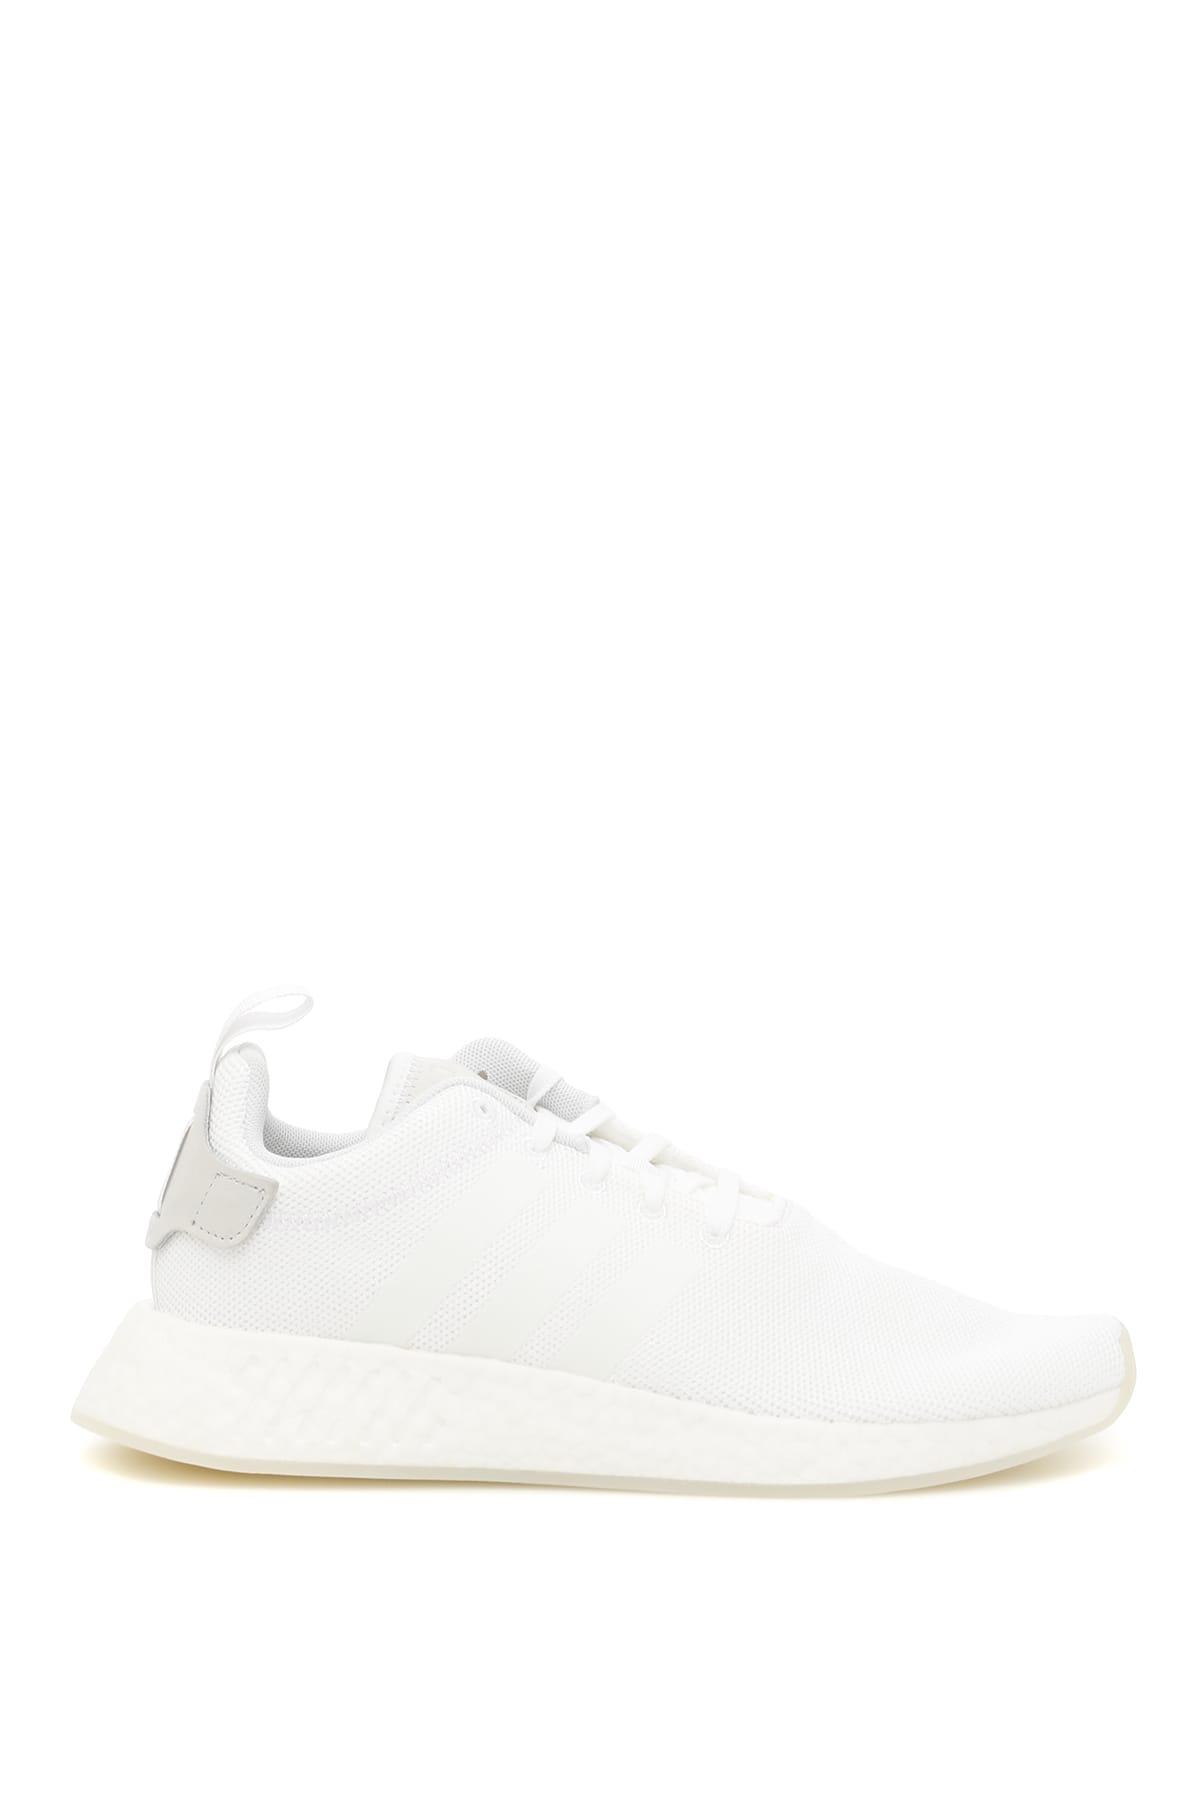 buy popular 6fd89 d58e3 Adidas Nmd R2 Originals Sneakers